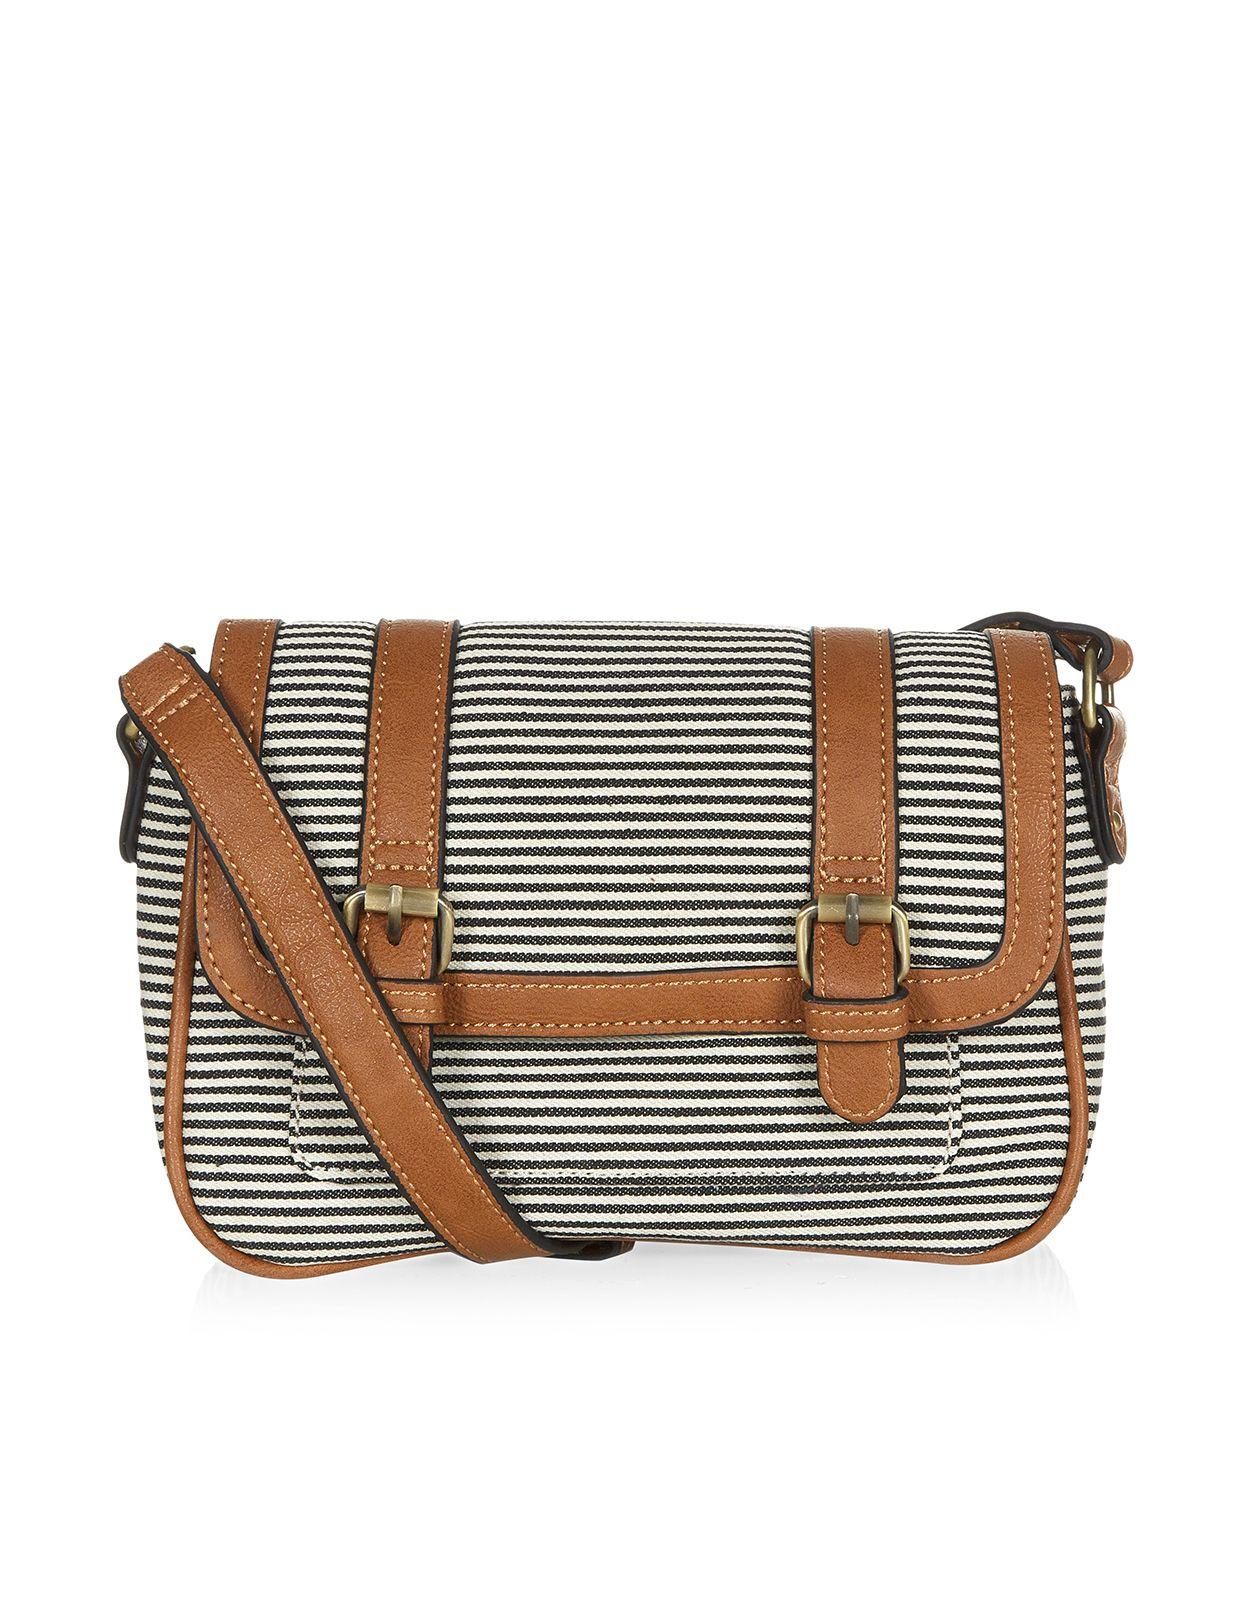 88a33113e7 Stripe Double Zip Across Body Bag   Multi   Accessorize   Clothes ...